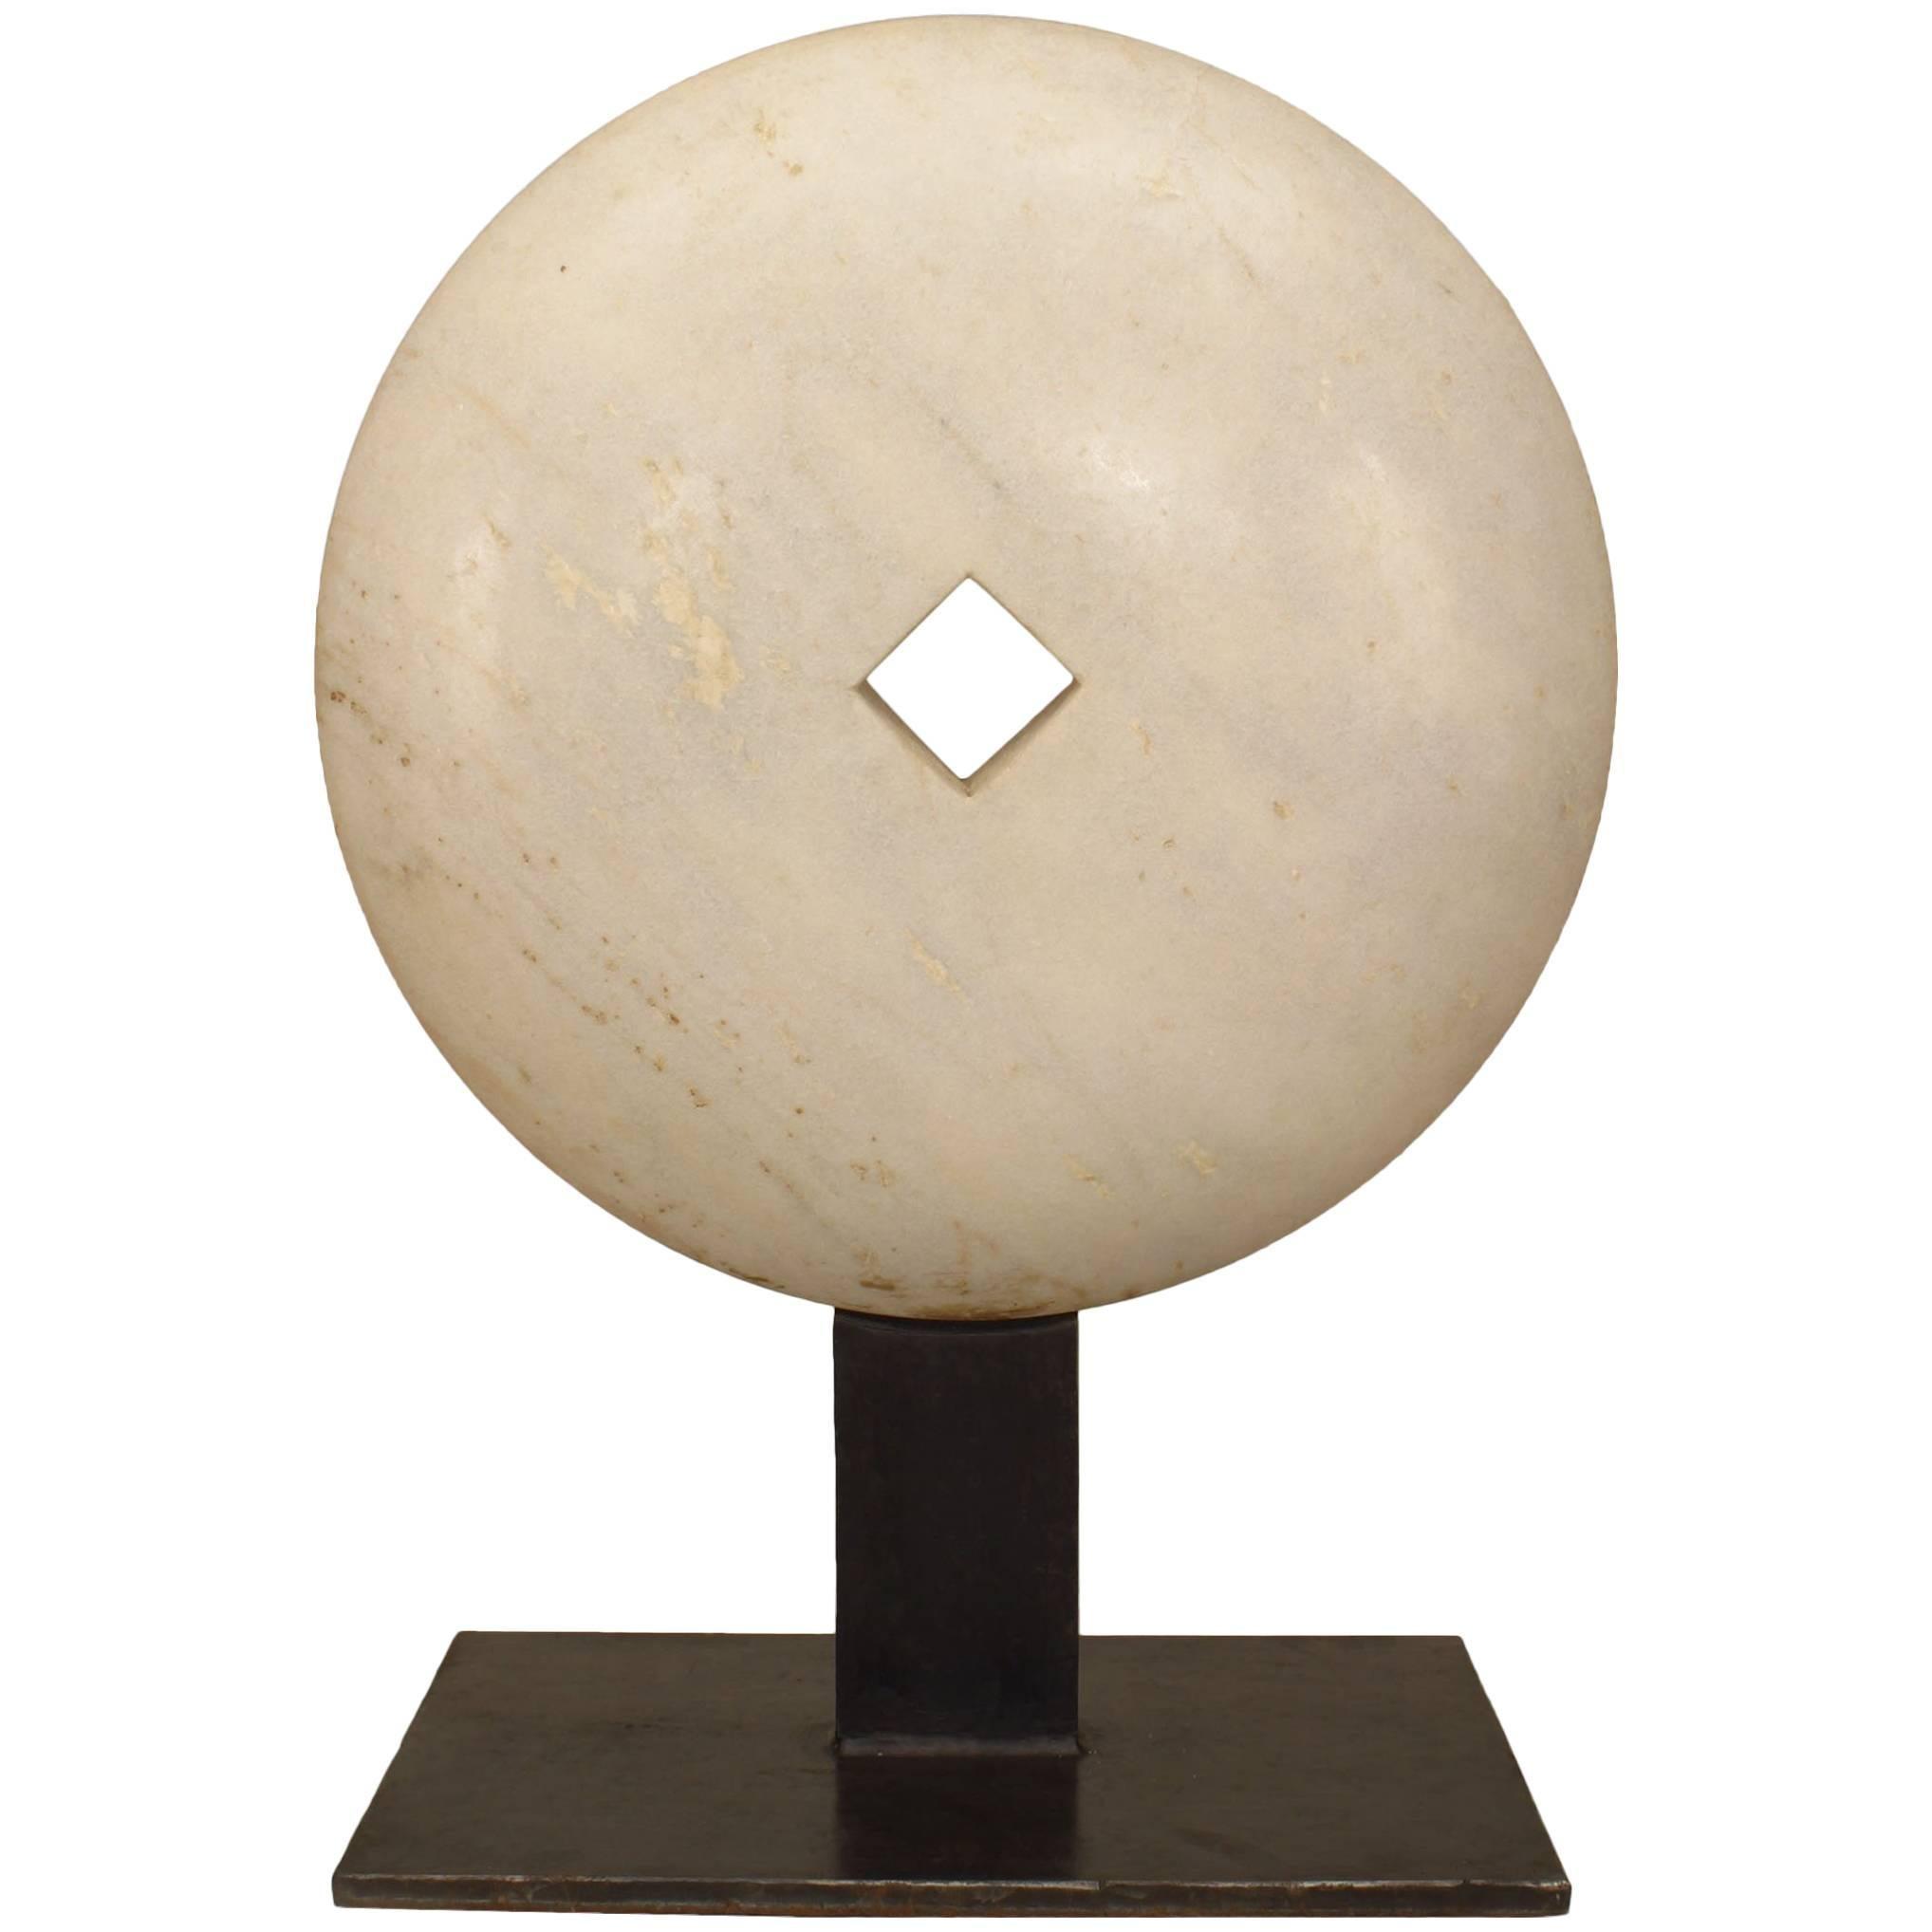 American Post-War Marble Disk Sculpture